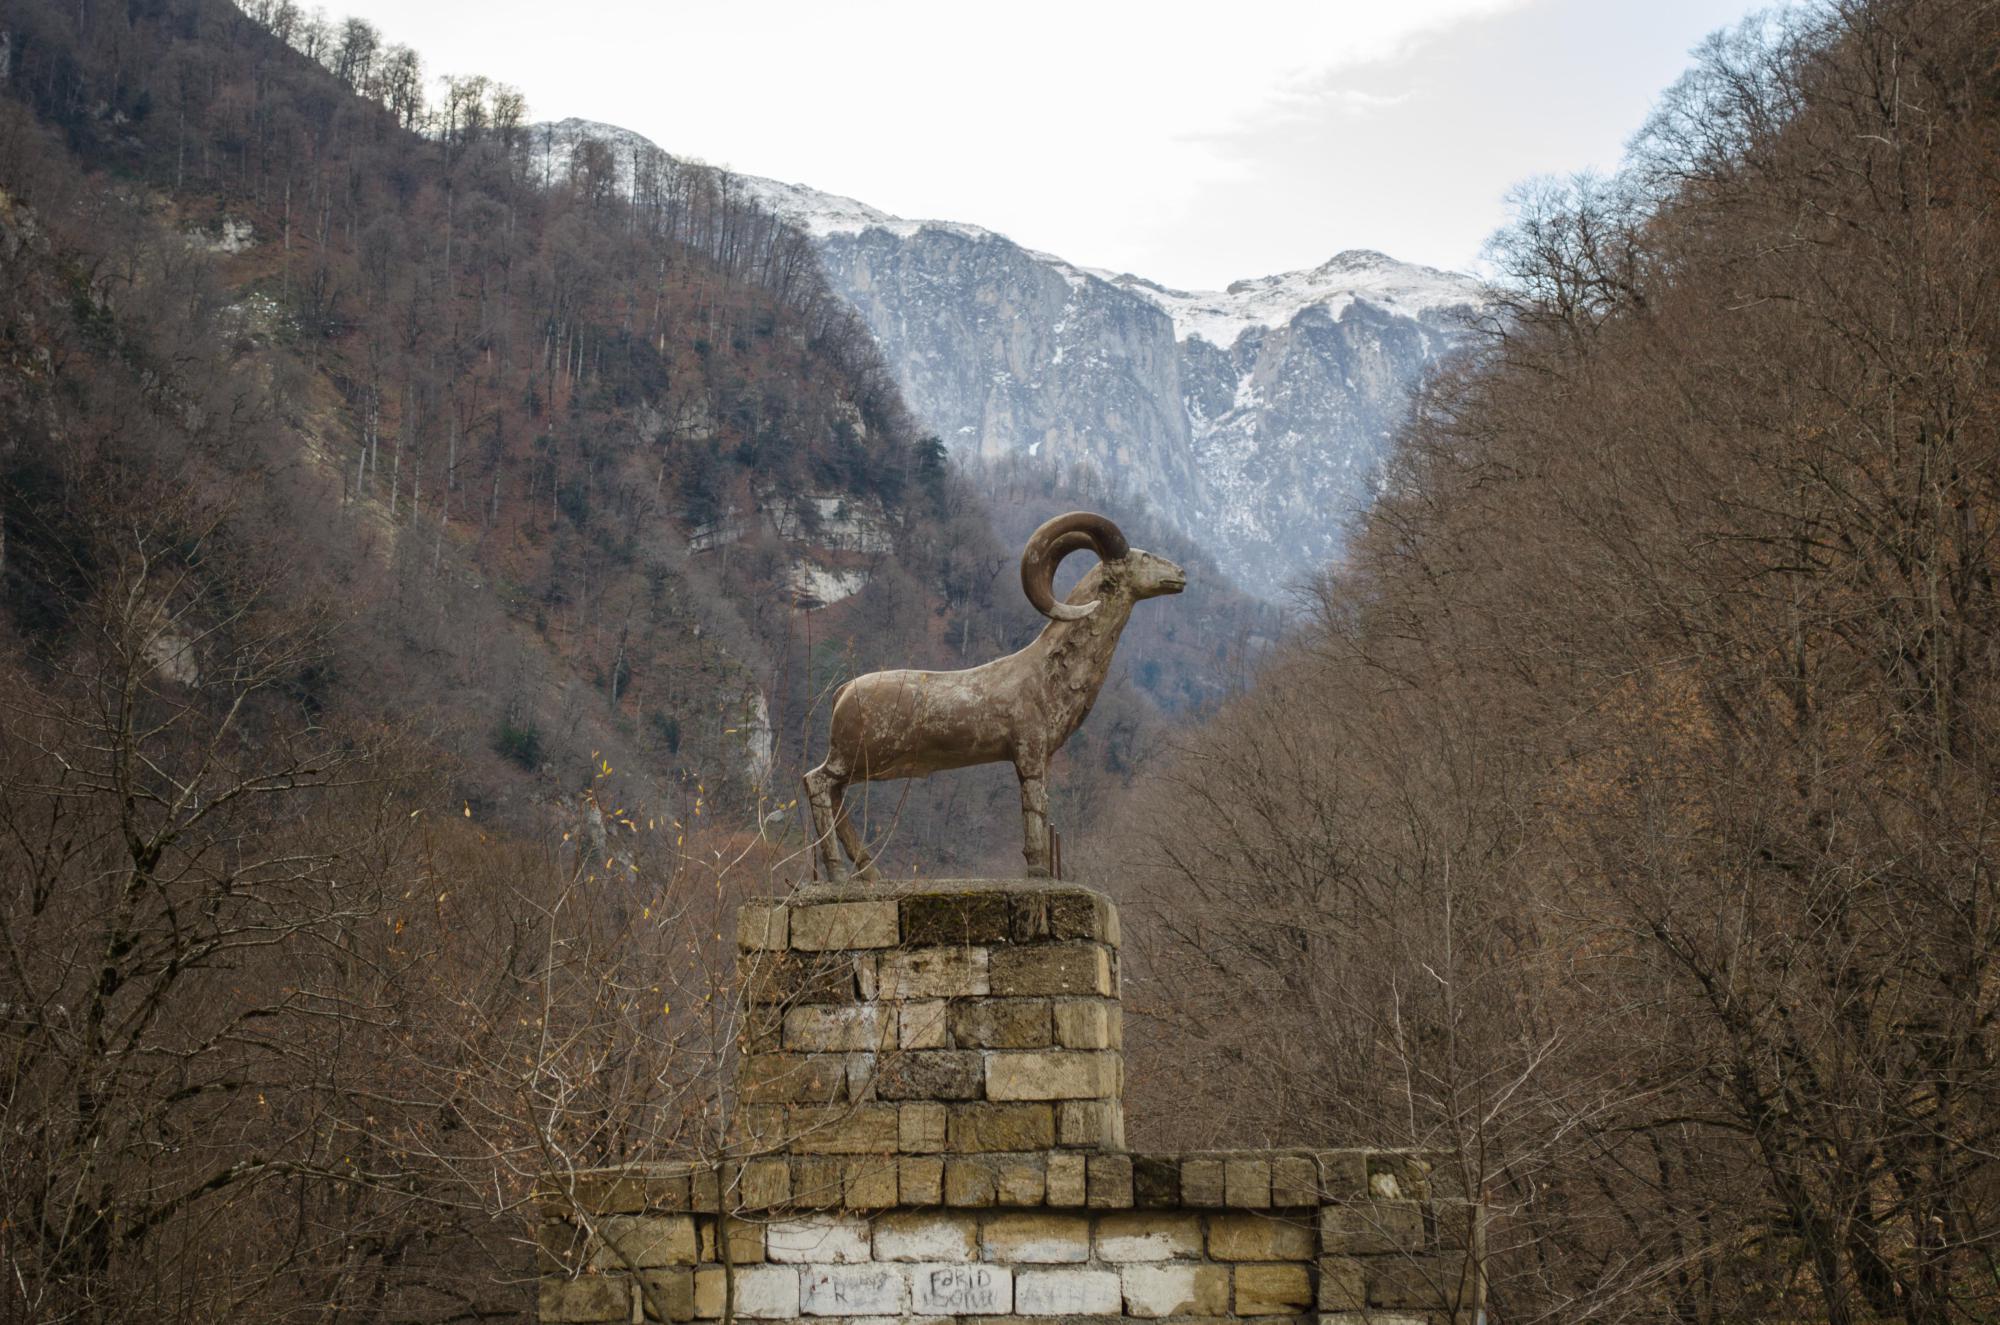 Mountain goat statue